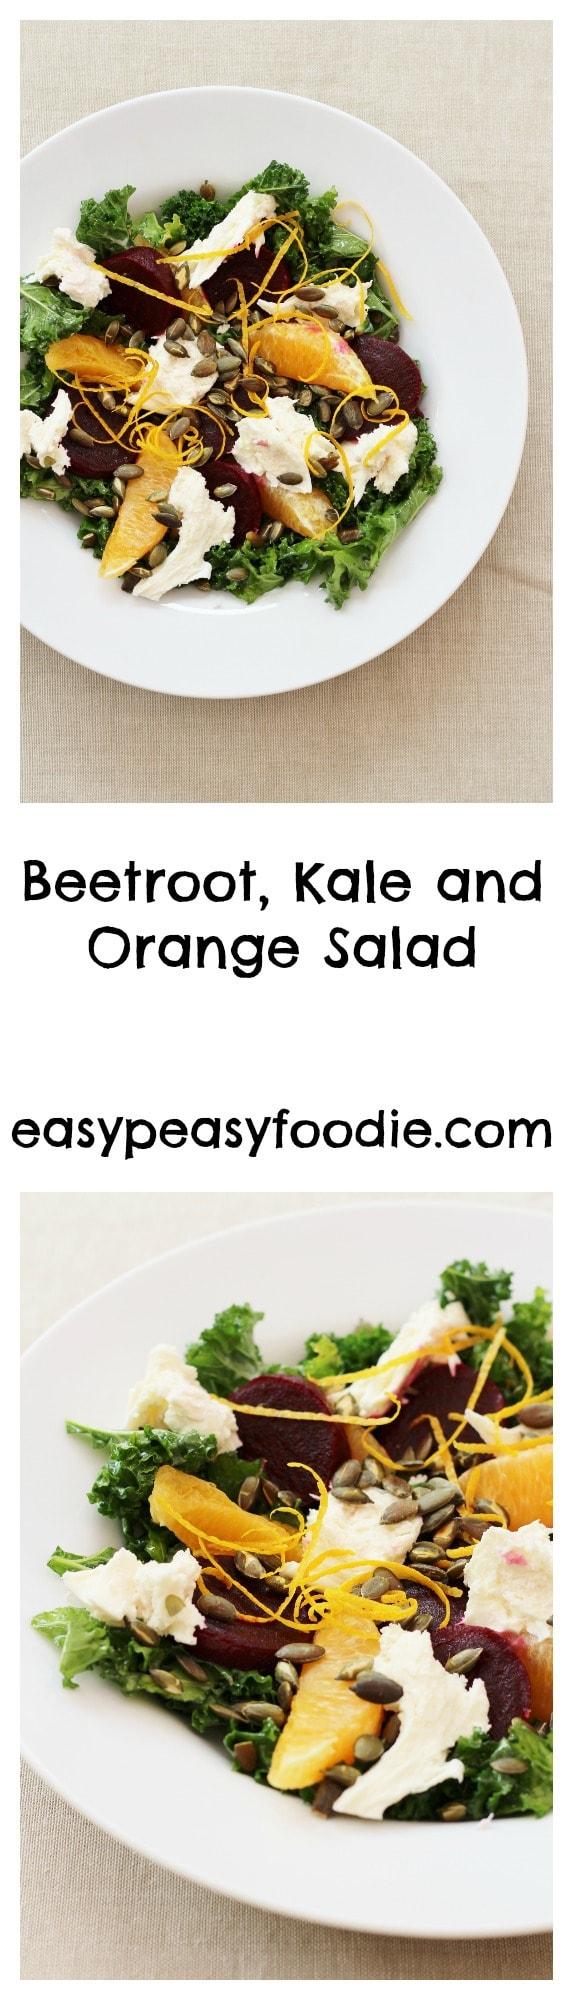 Beetroot, Kale and Orange Salad - pinnable image for Pinterest